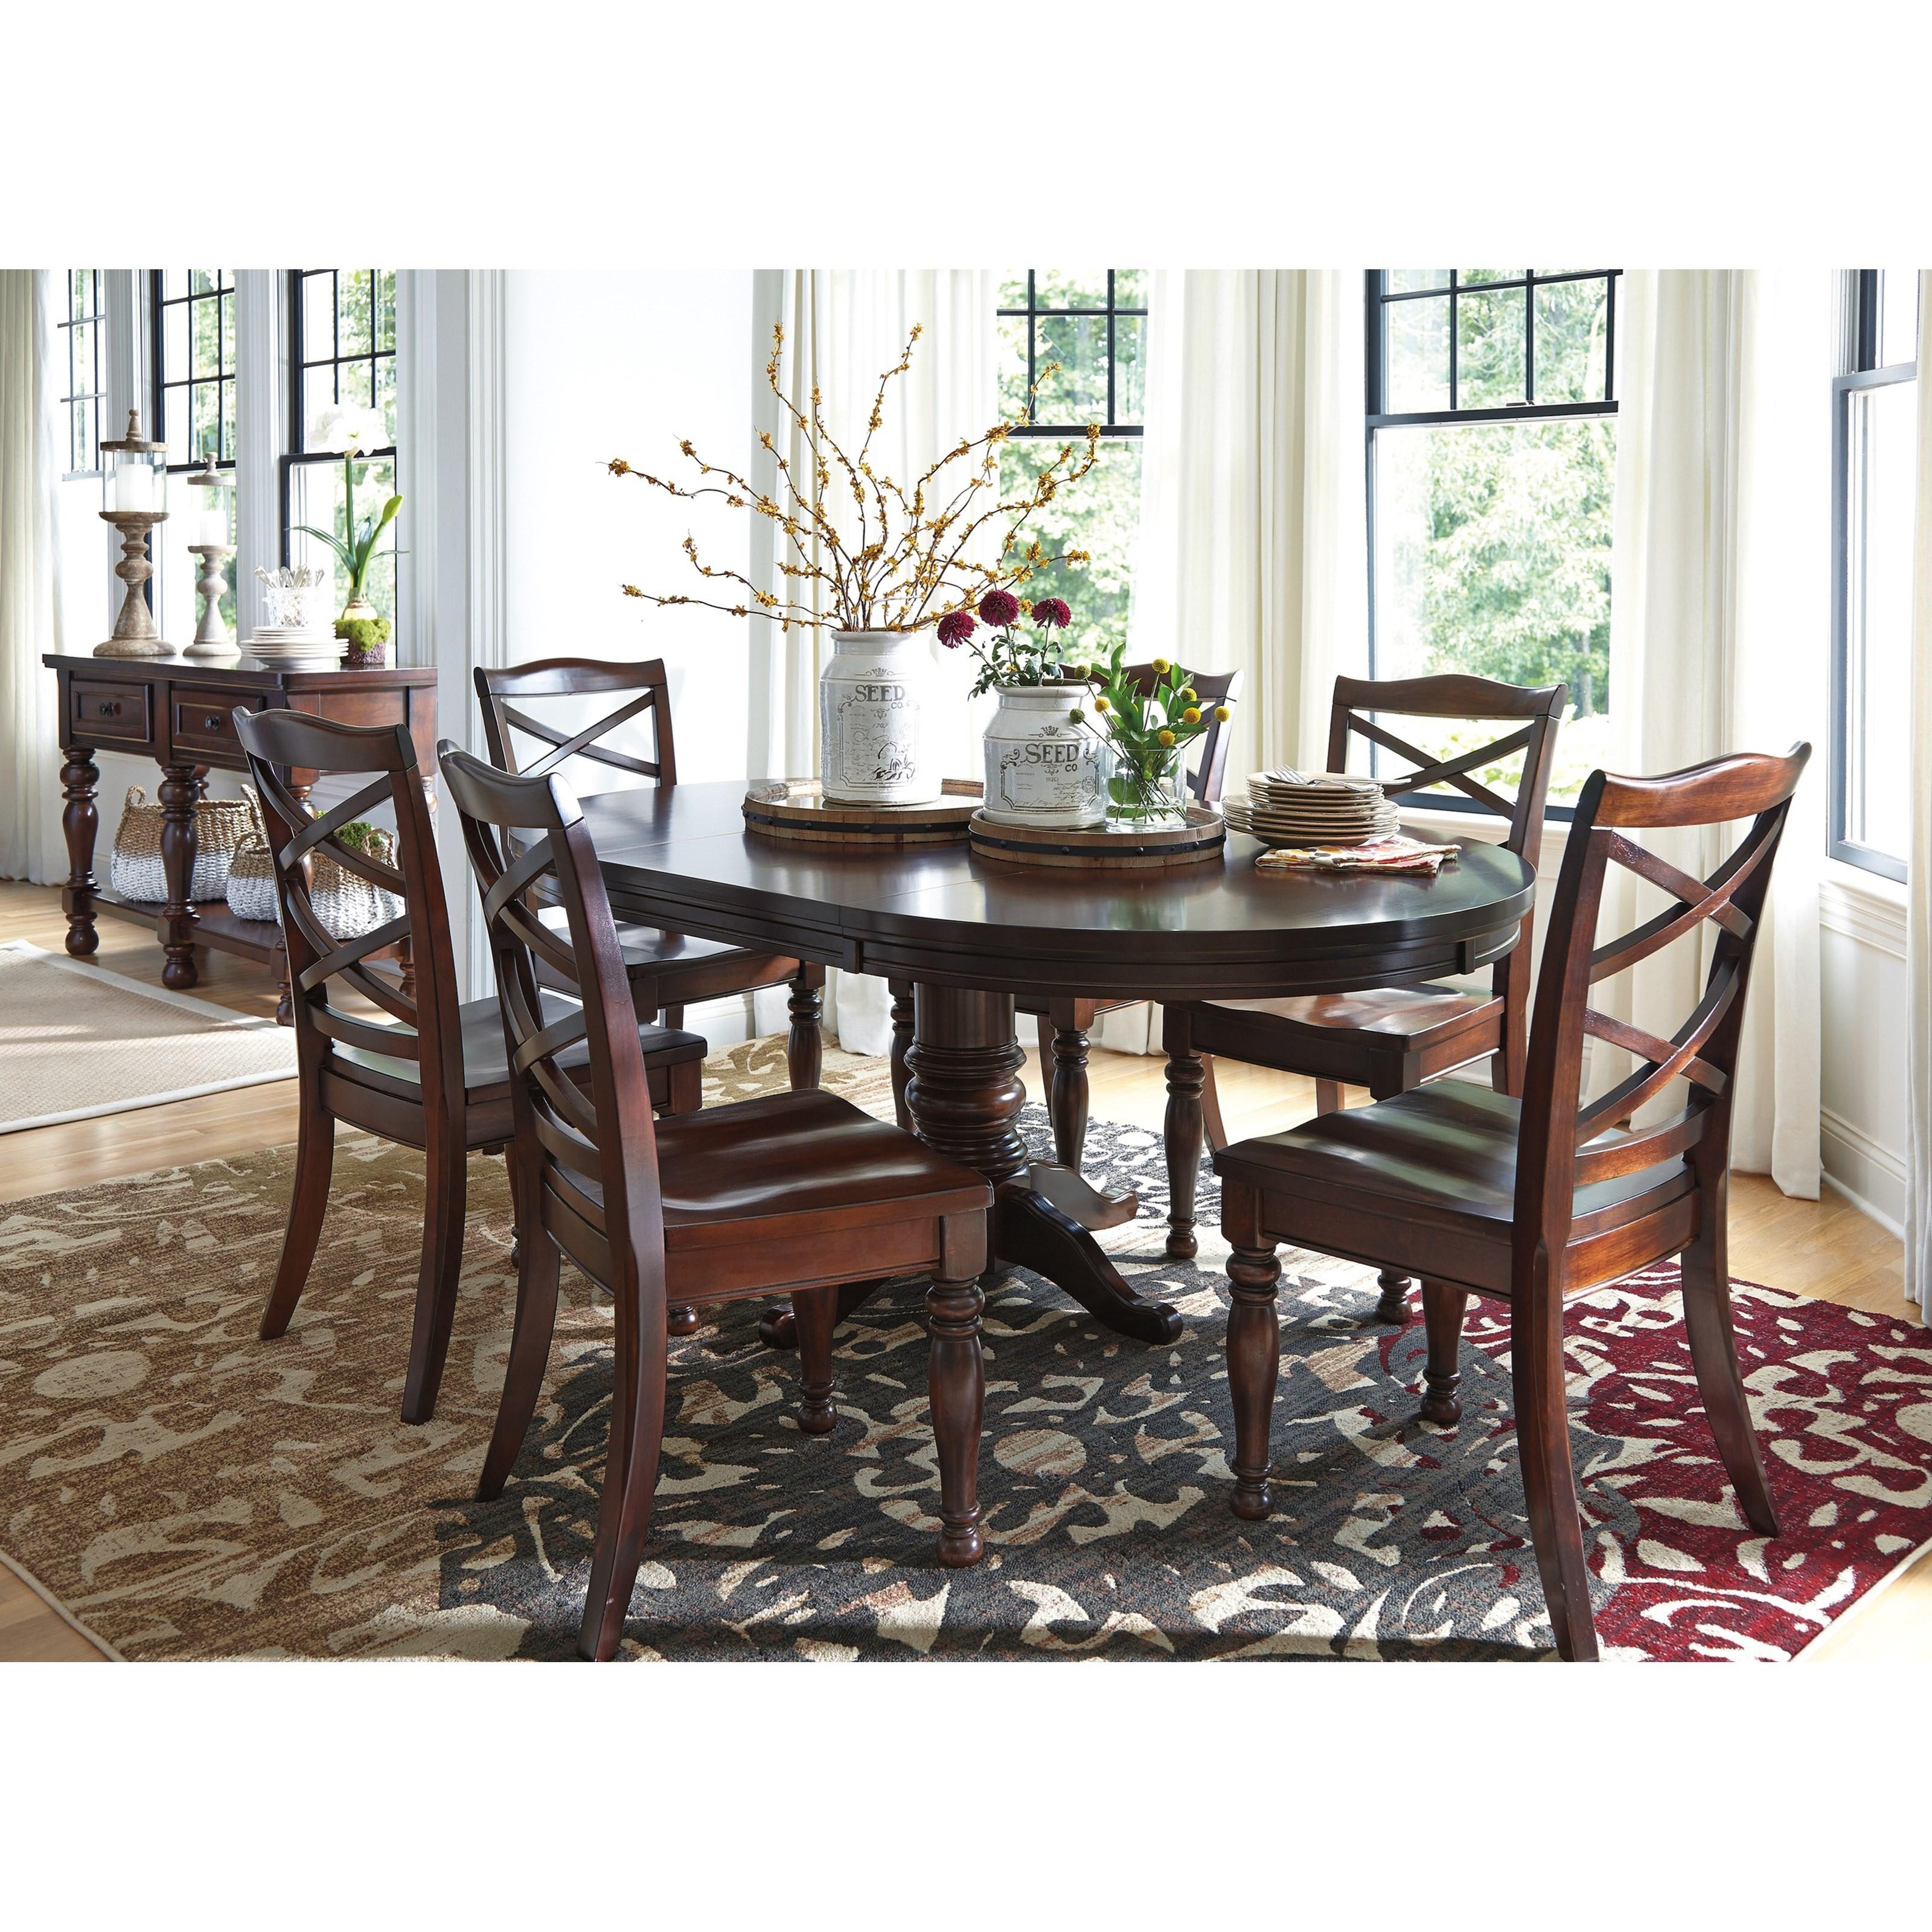 Dining room furniture ashley